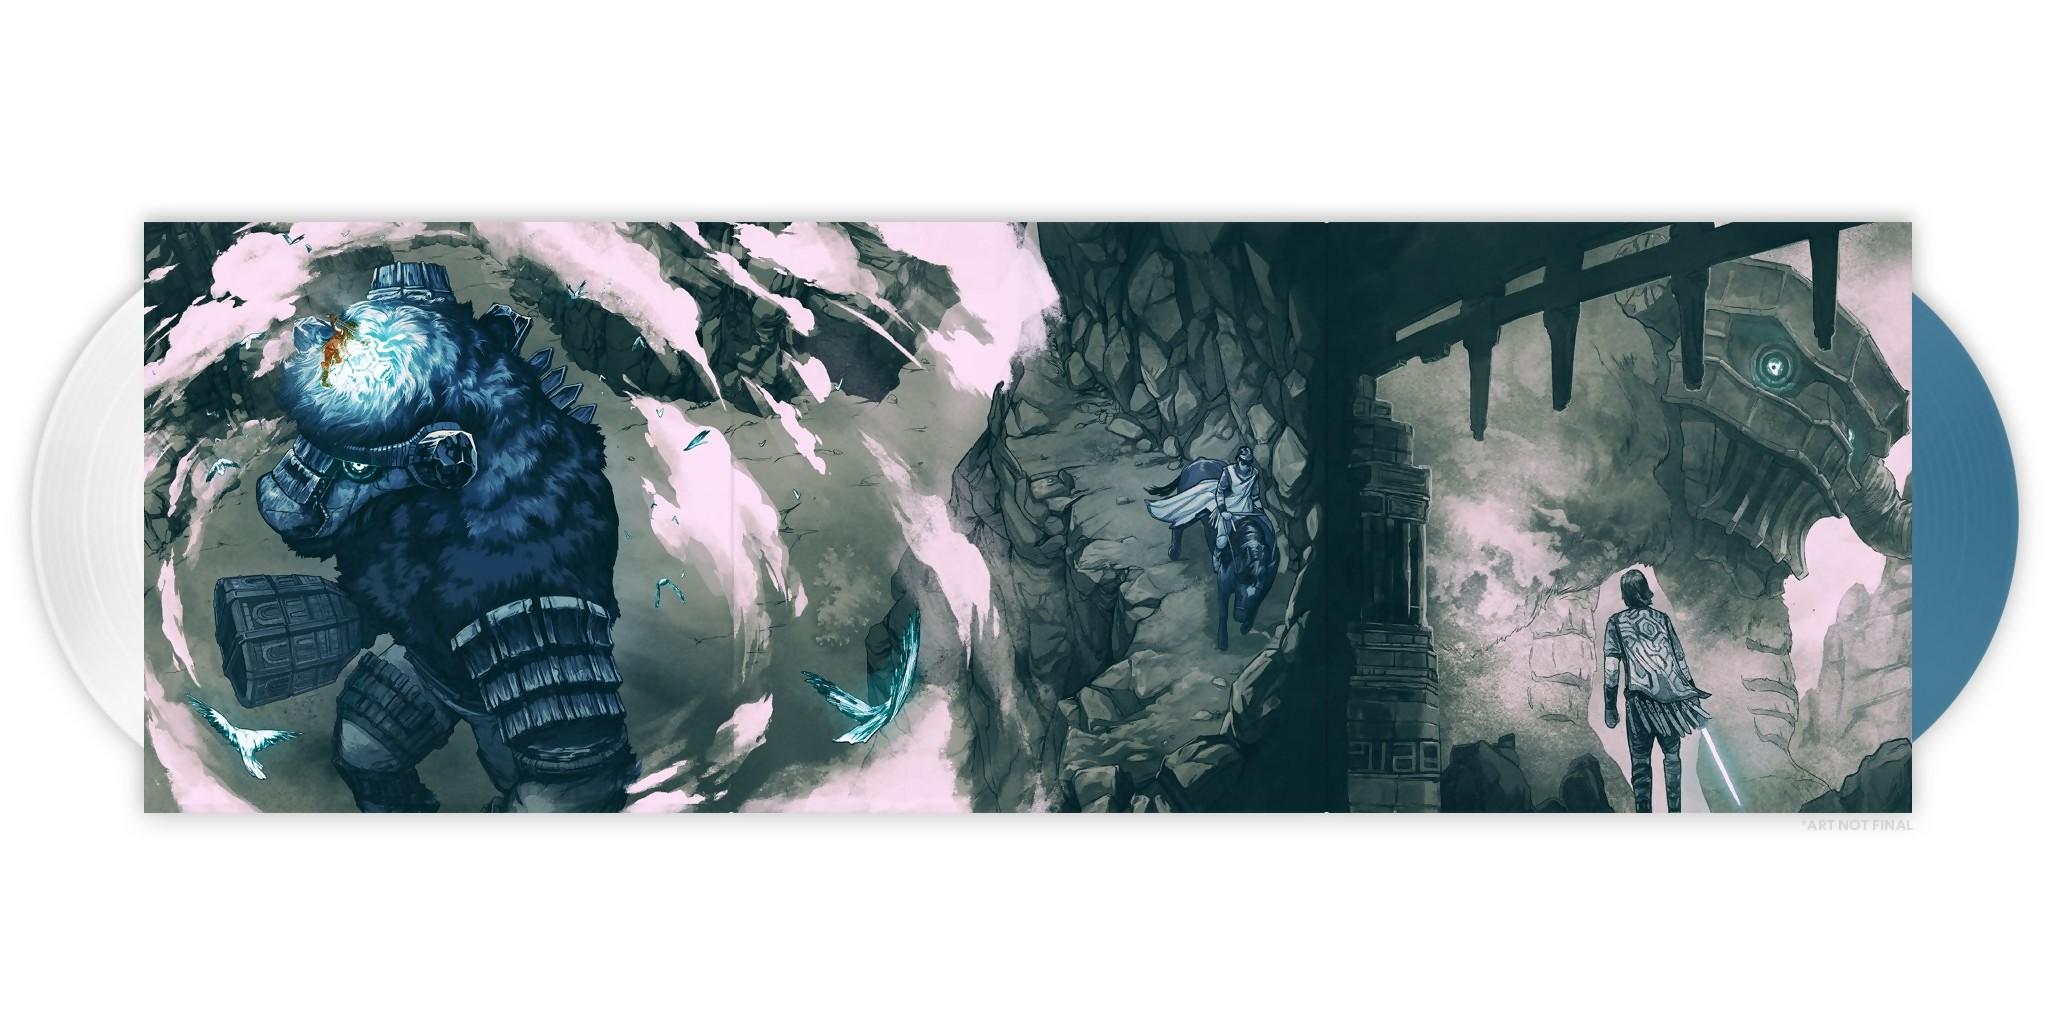 shadow-of-the-colossus-ph-5a6b396757169